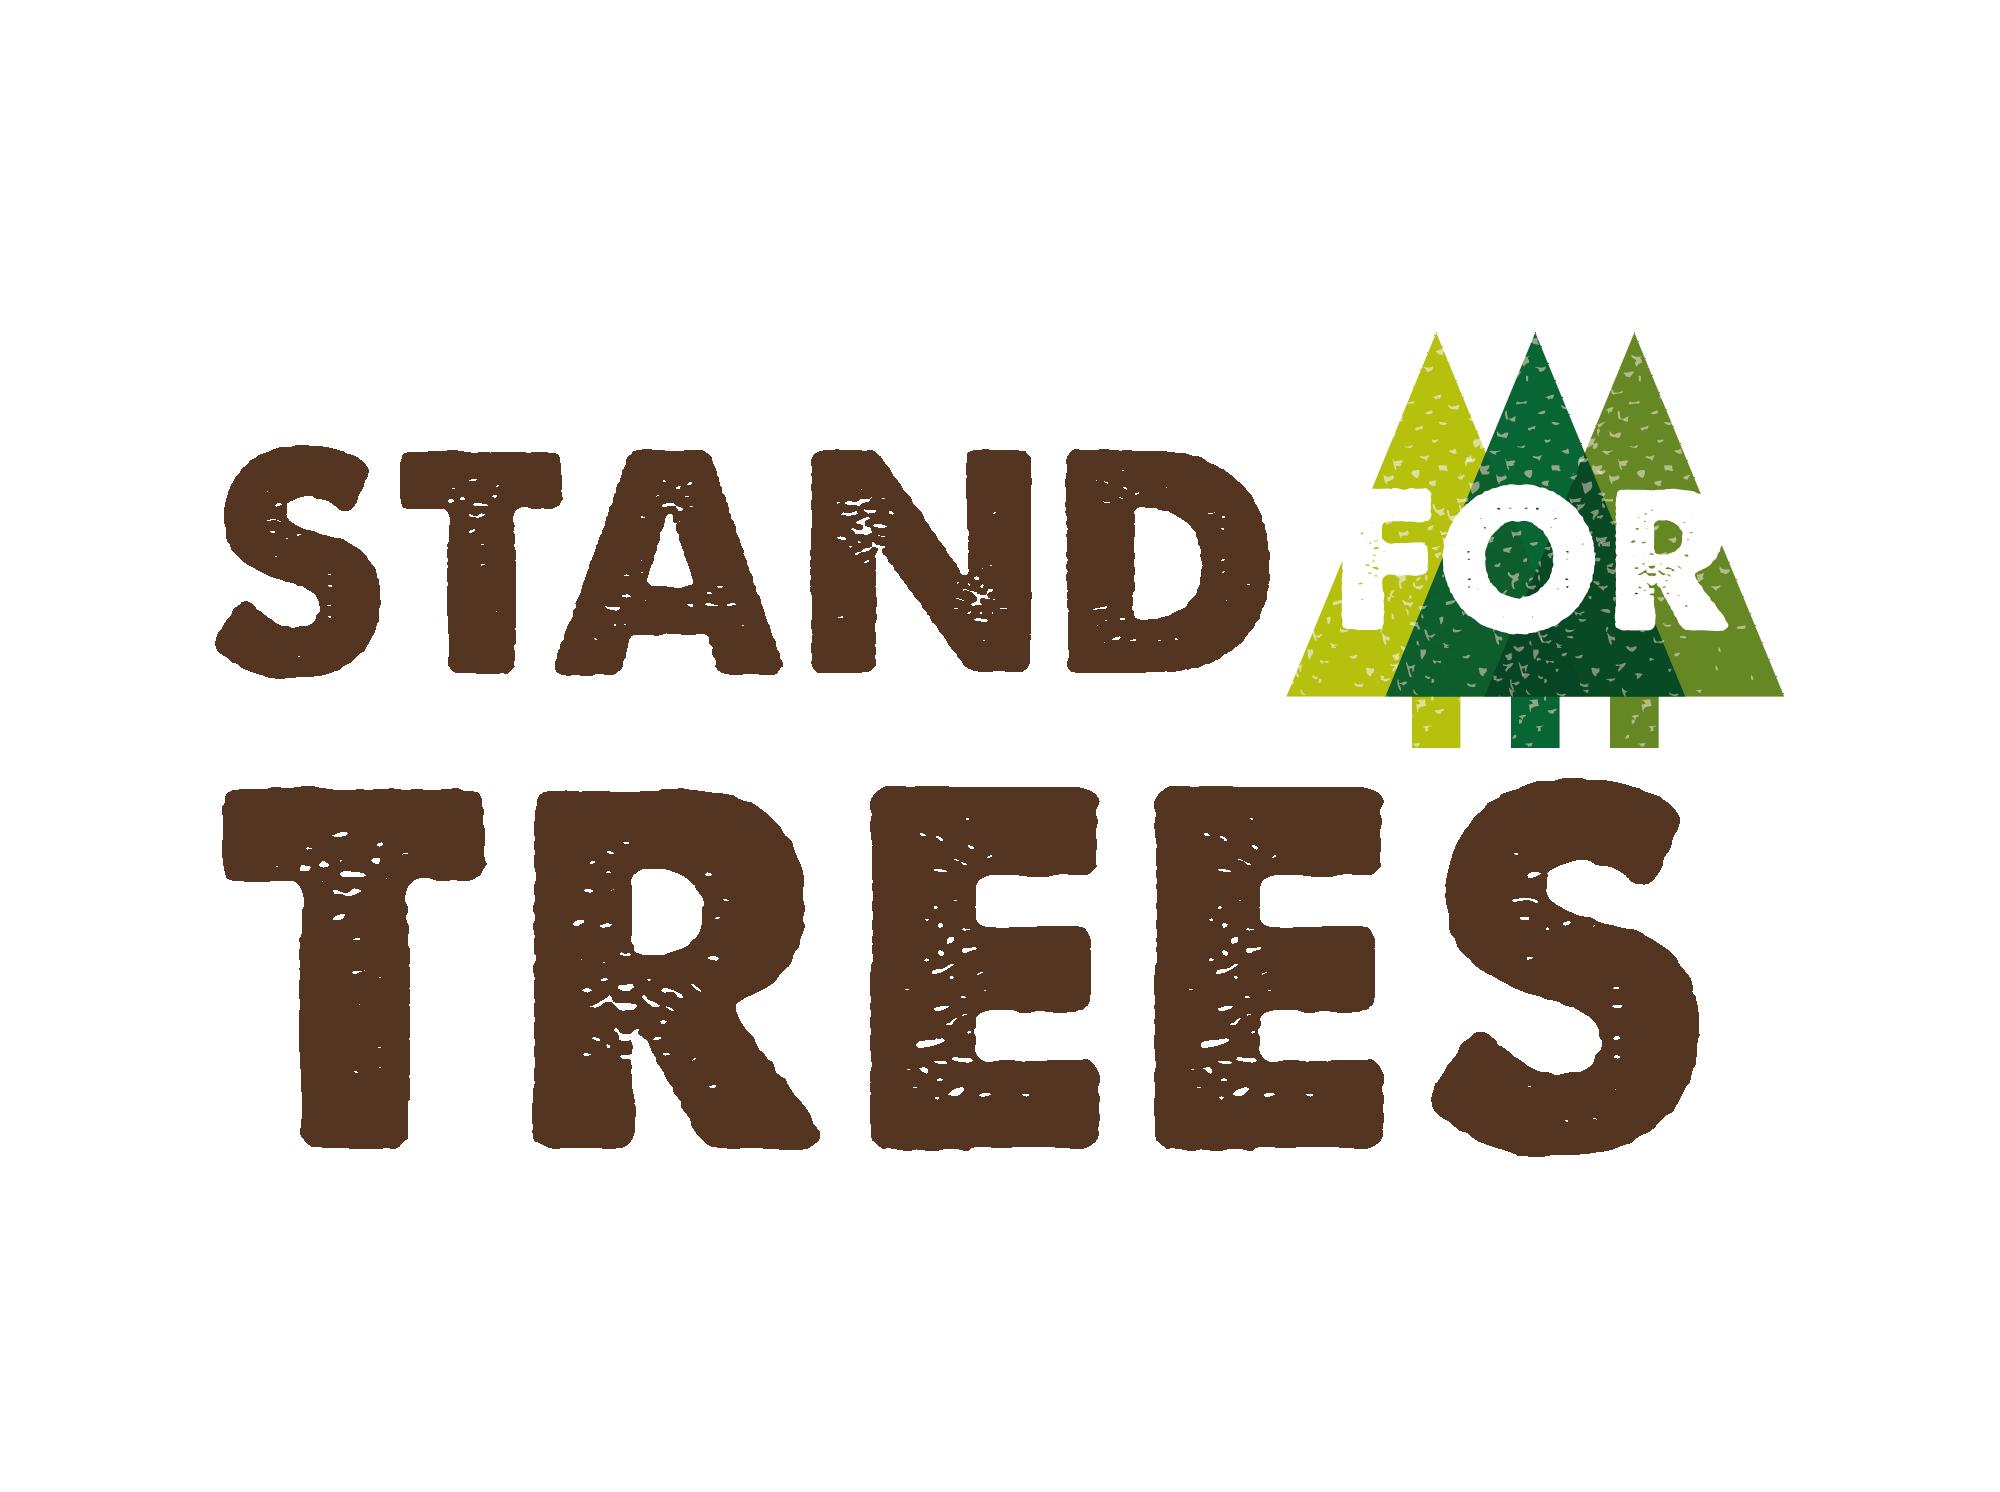 Strand For Trees